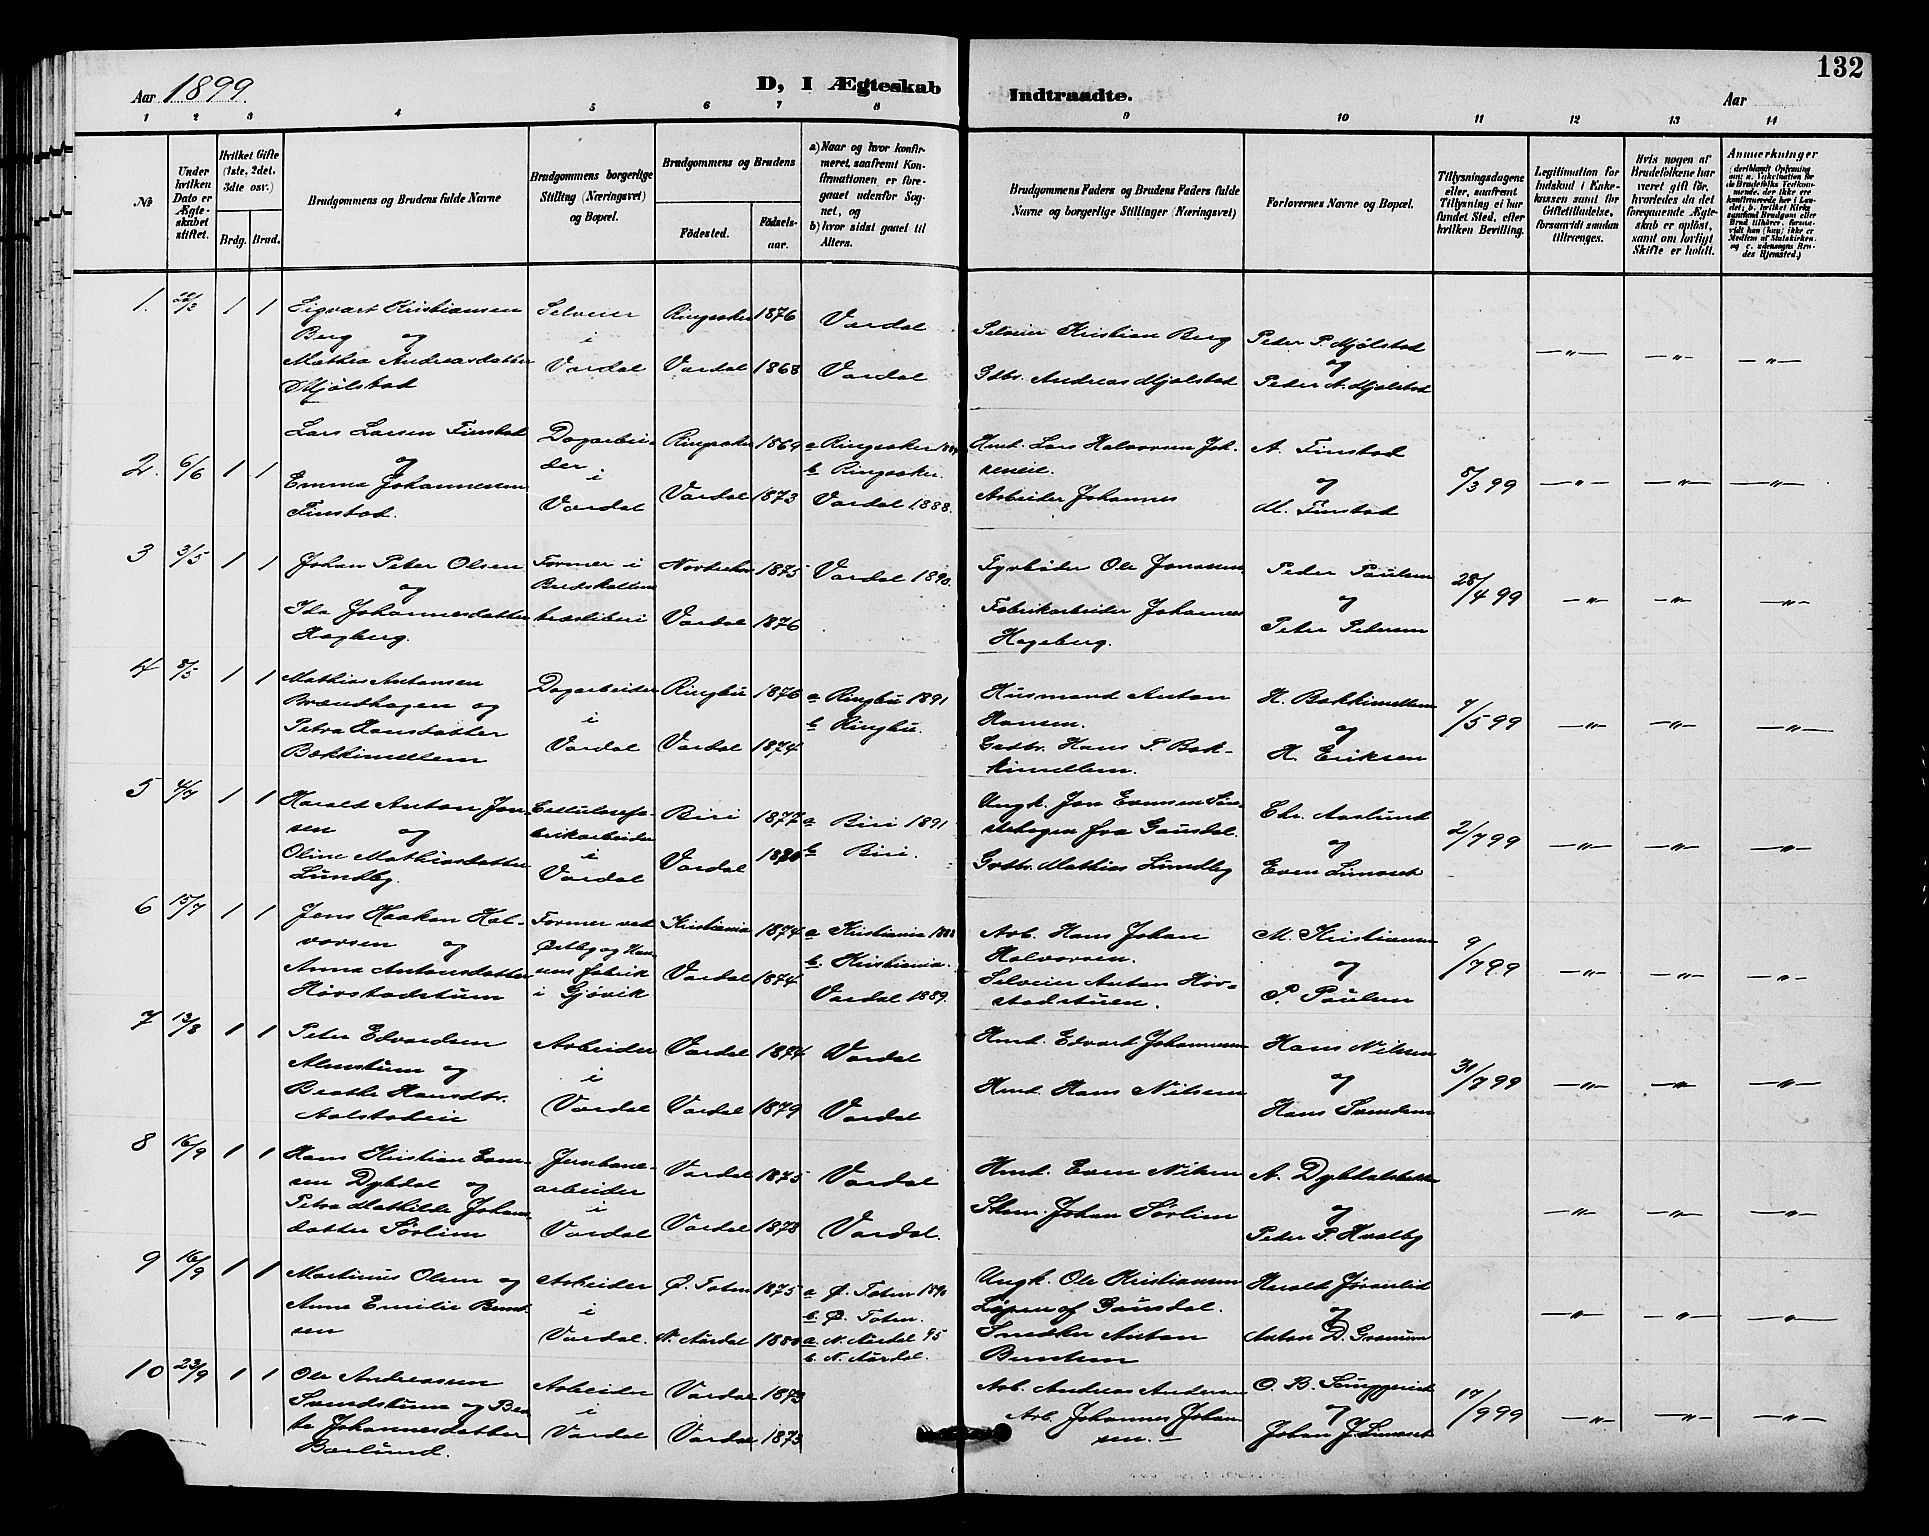 SAH, Vardal prestekontor, H/Ha/Hab/L0011: Klokkerbok nr. 11, 1899-1913, s. 132